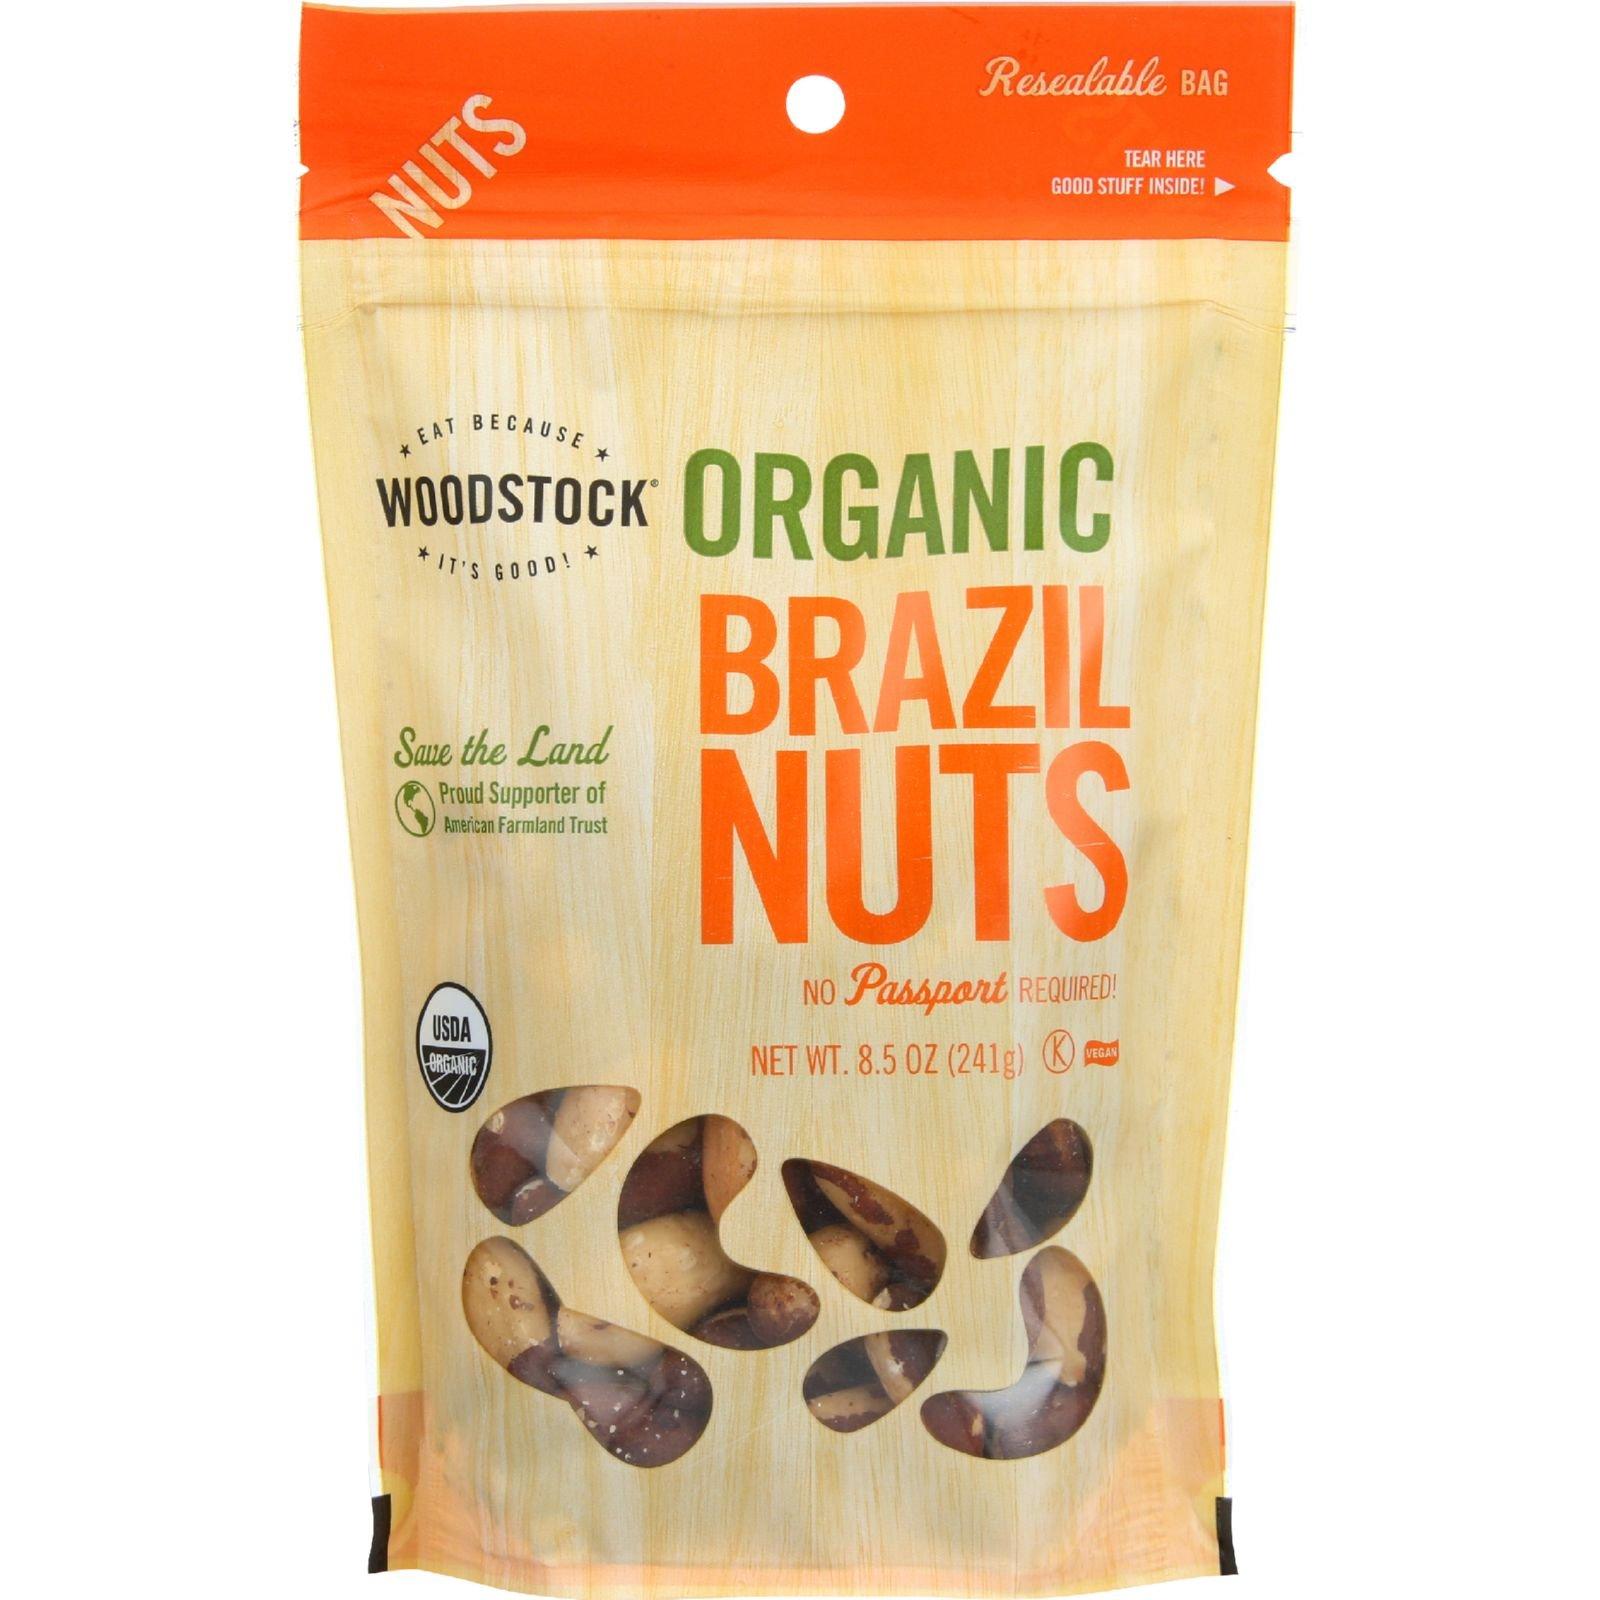 Woodstock Nuts - Organic Brazil Nuts - 8.5 oz - case of 8 - Vegan - Nutrient rich - No Sodium by Woodstock